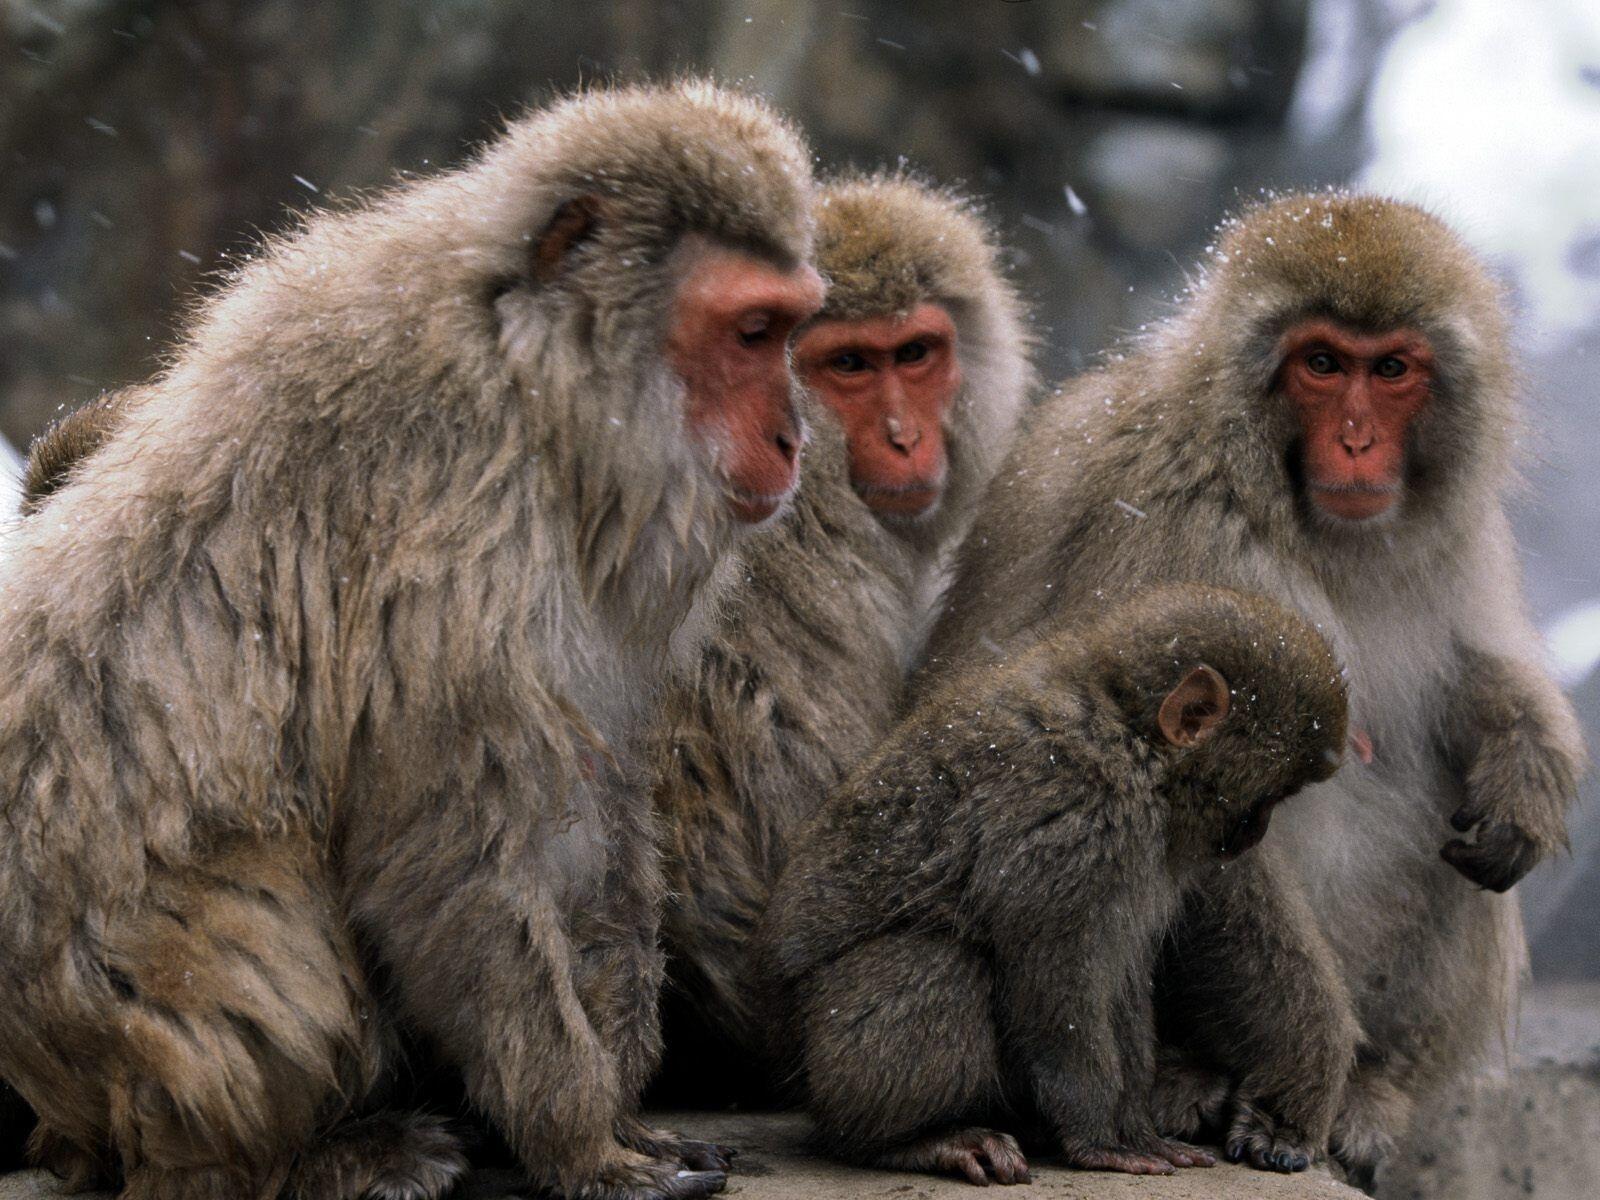 Monkey Wallpaper monkey wallpapers | free download best wild animals hd desktop images